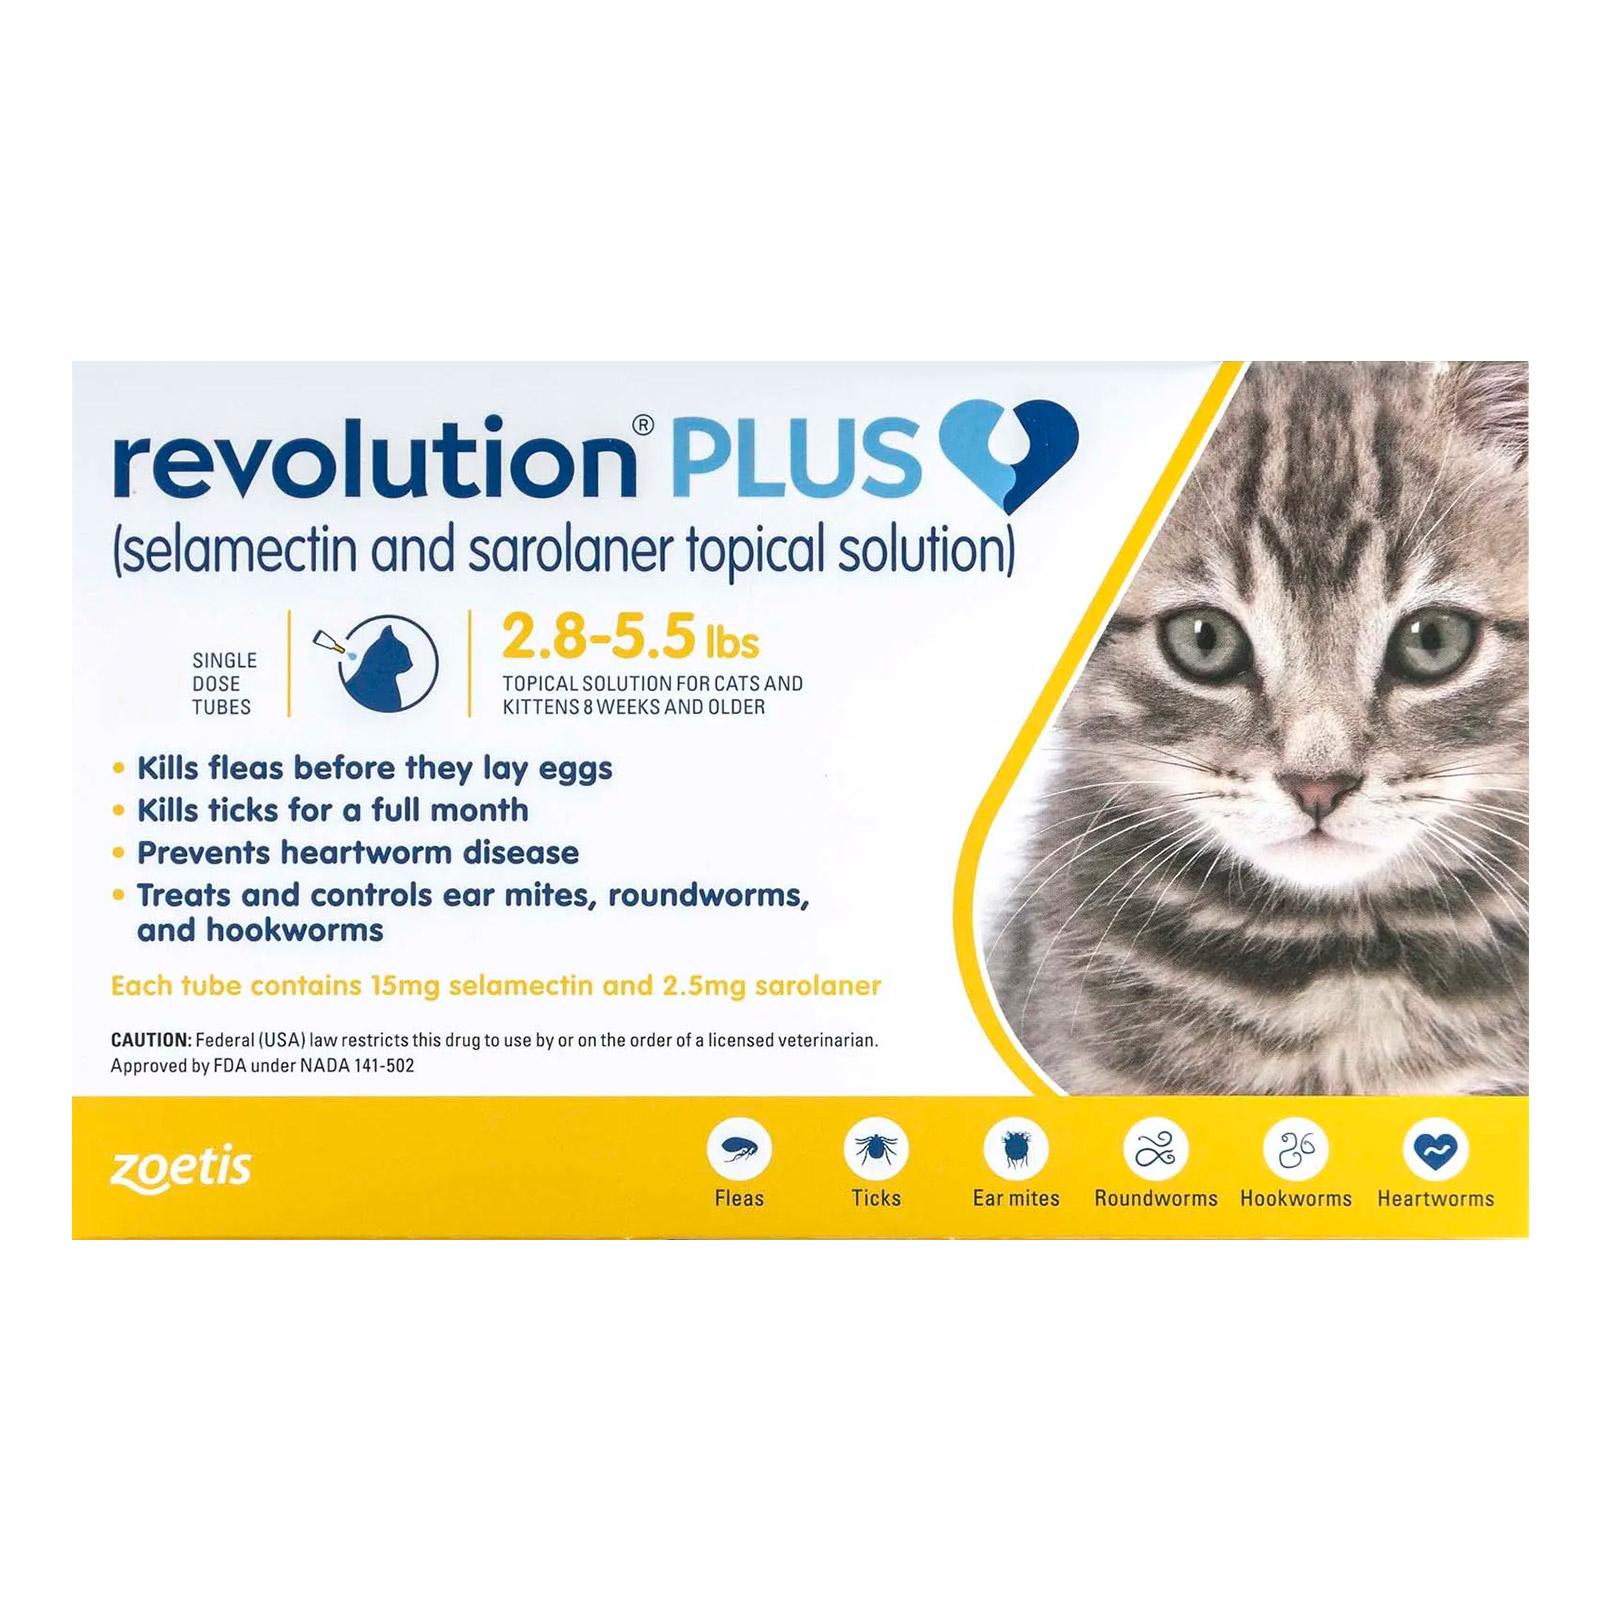 Revolution Plus For Cats Buy Revolution Plus Flea Tick Heartworm Treatment For Cats